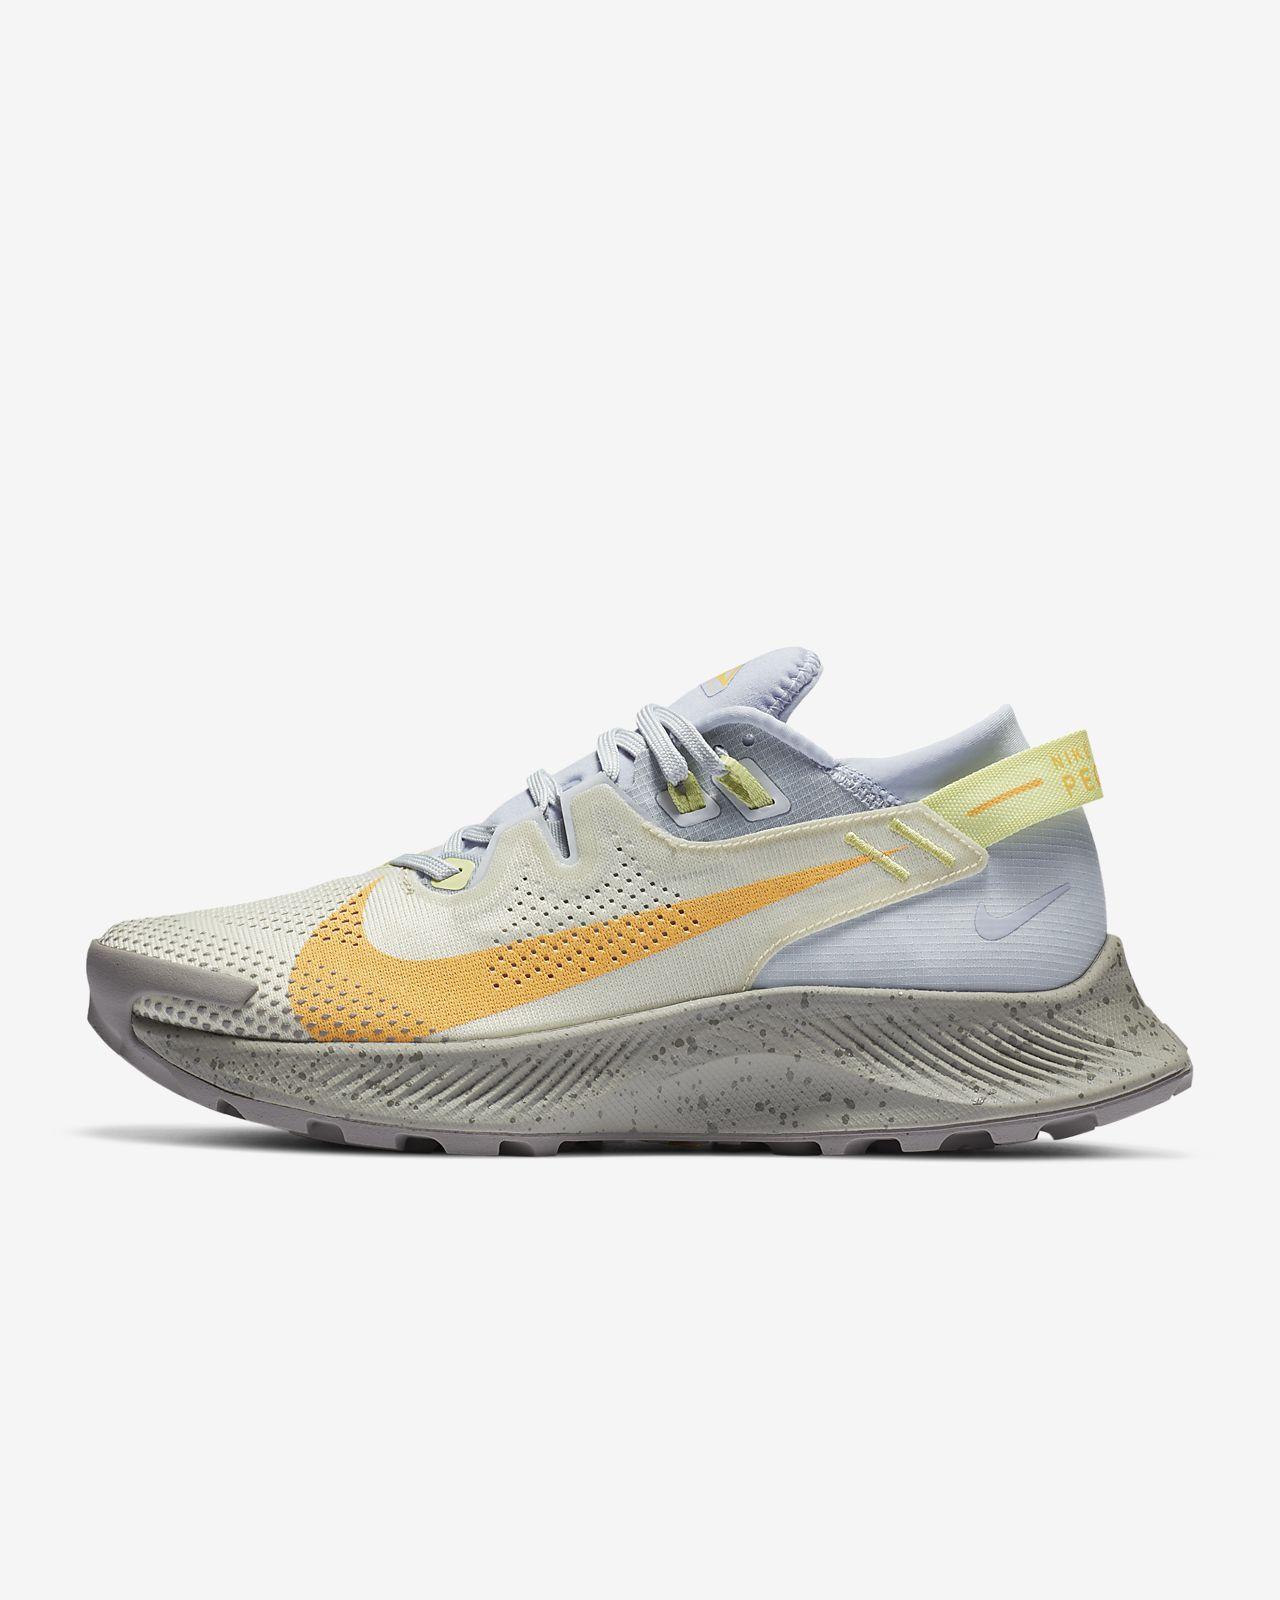 Irónico Joseph Banks Te mejorarás  Nike Pegasus Trail 2 Women's Trail Running Shoe. Nike.com | Trail running  shoes, Nike pegasus, Trail shoes women